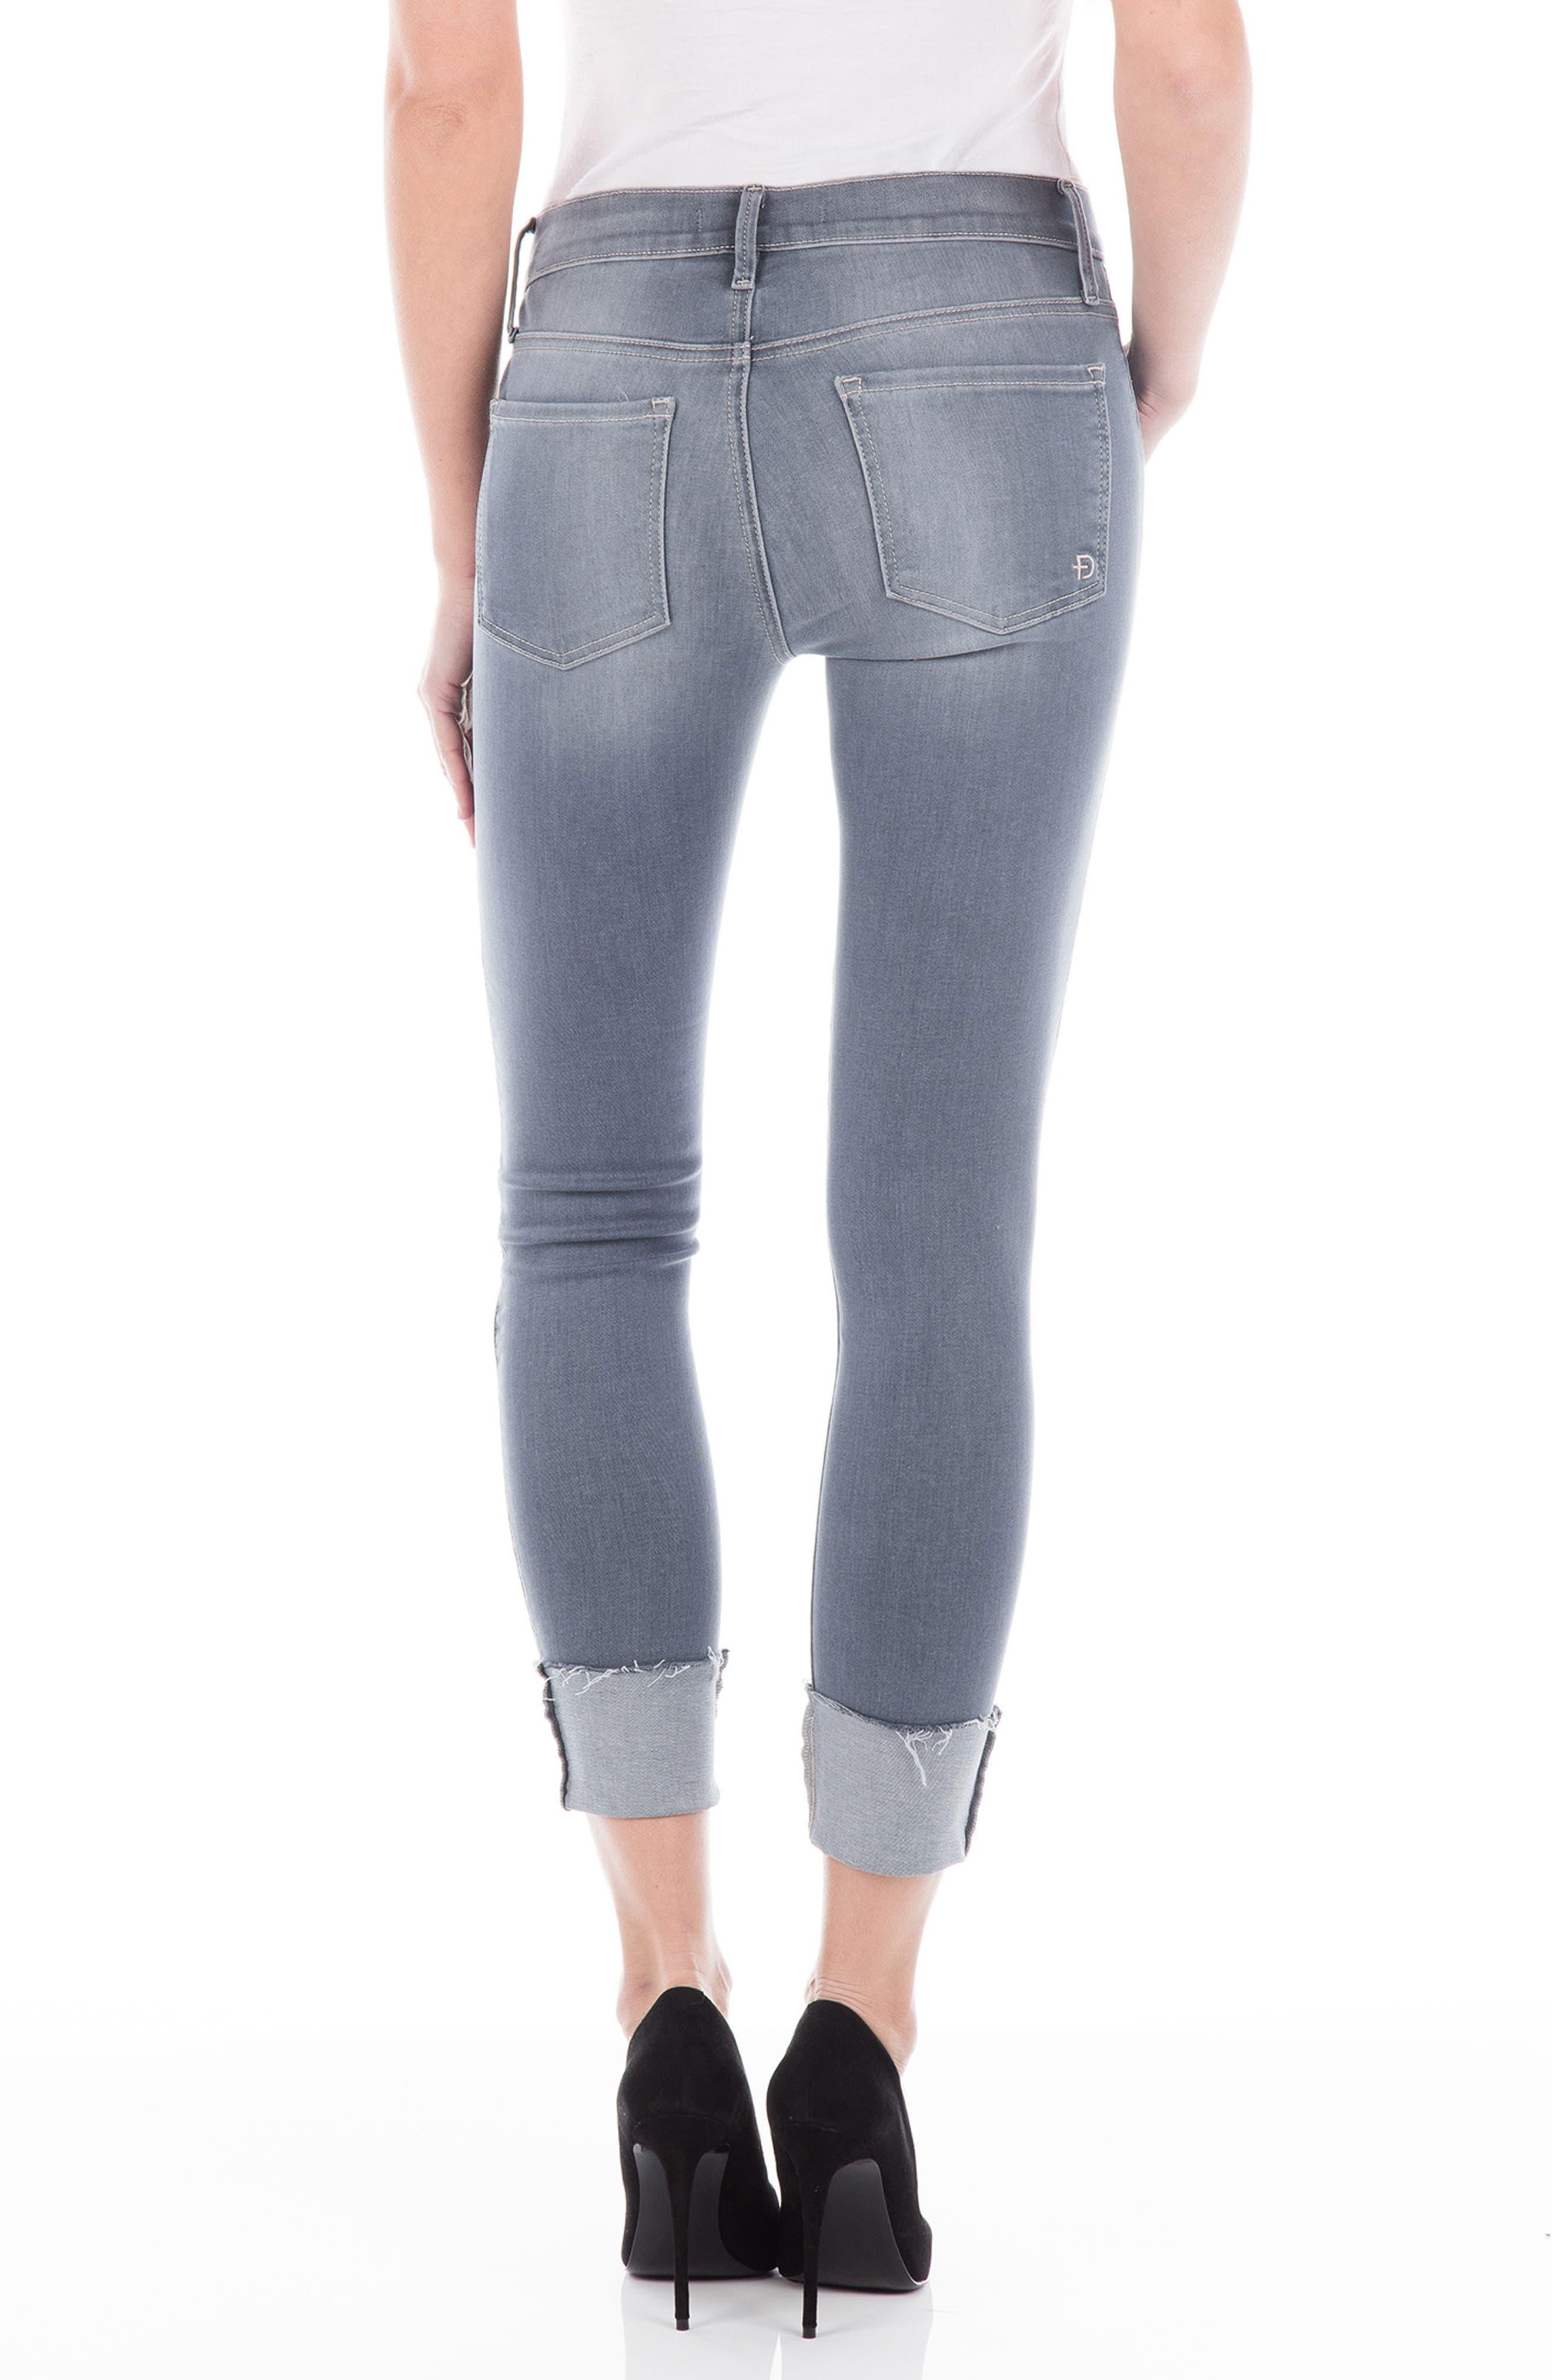 Belvedere Crop Skinny Jeans,                             Alternate thumbnail 2, color,                             Chrome